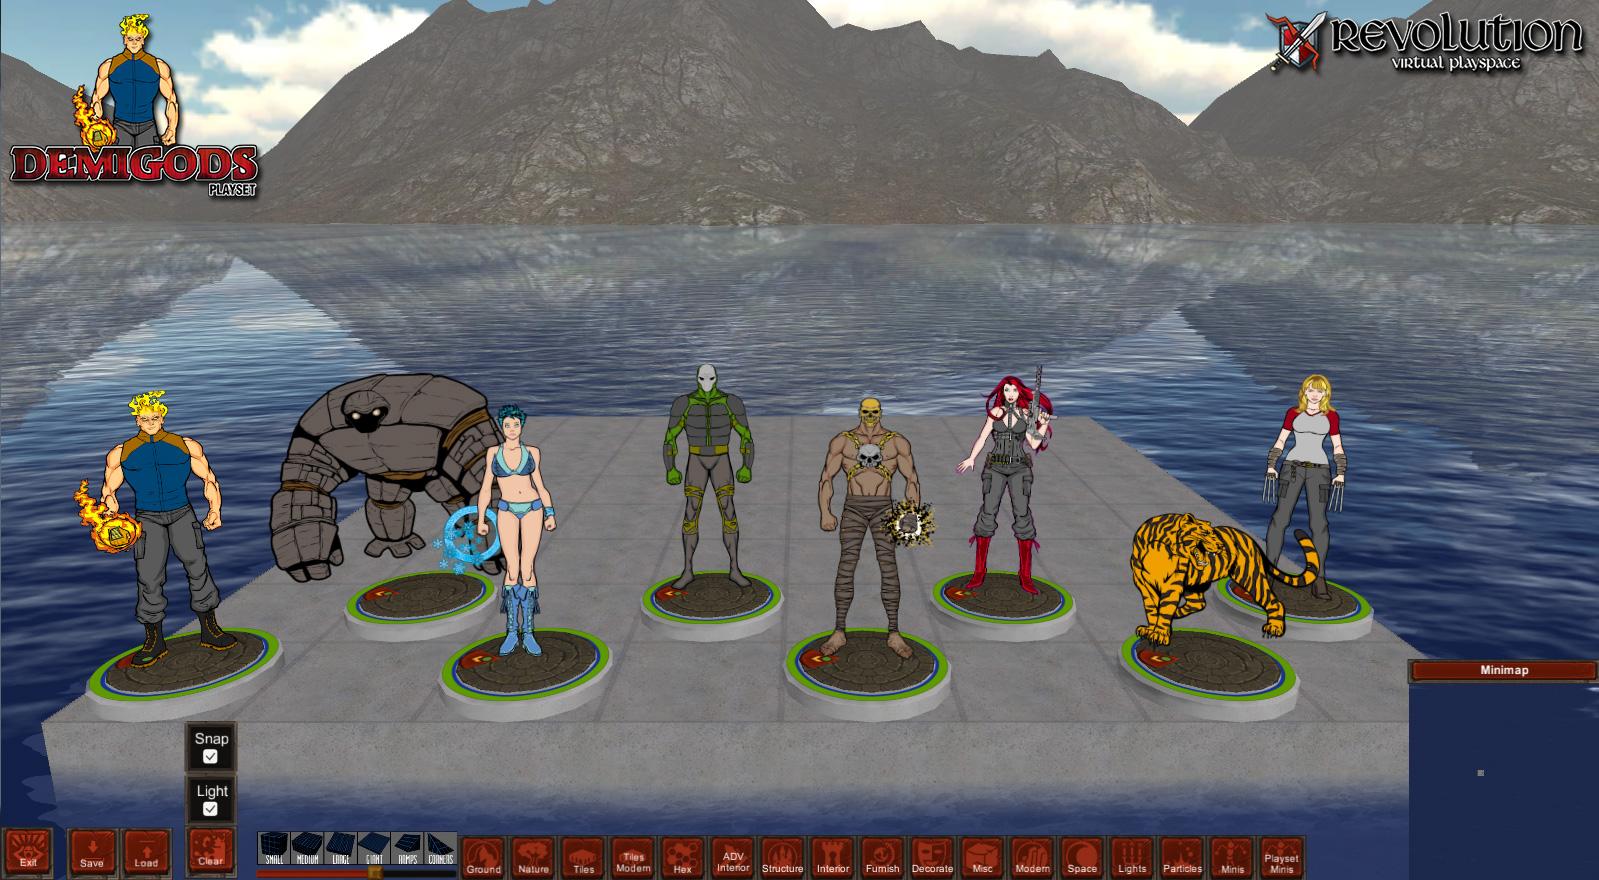 Revolution Virtual Pla...